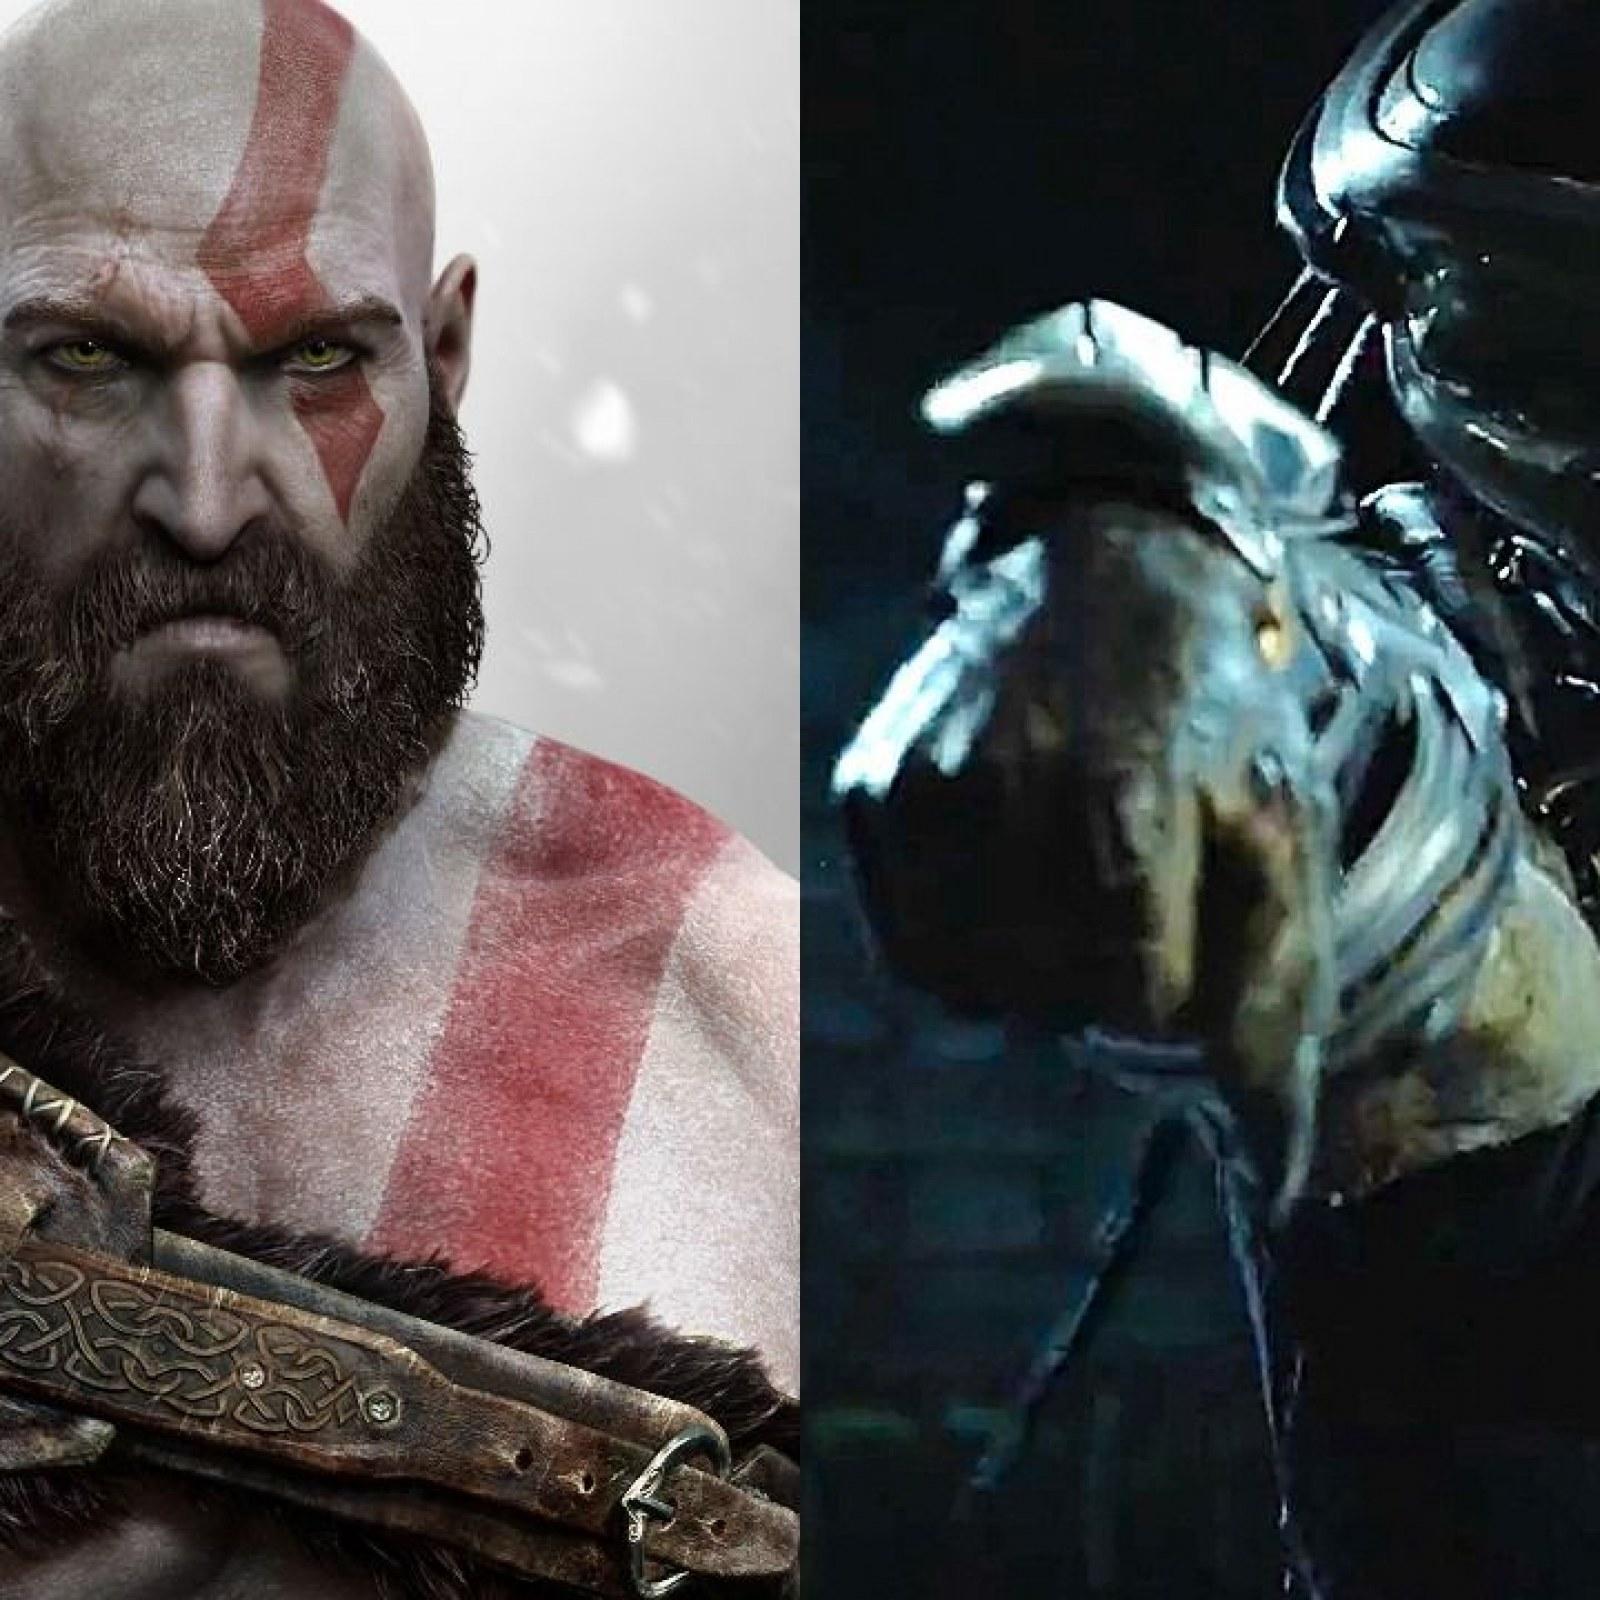 God Of War S Kratos Inspired The New Predator